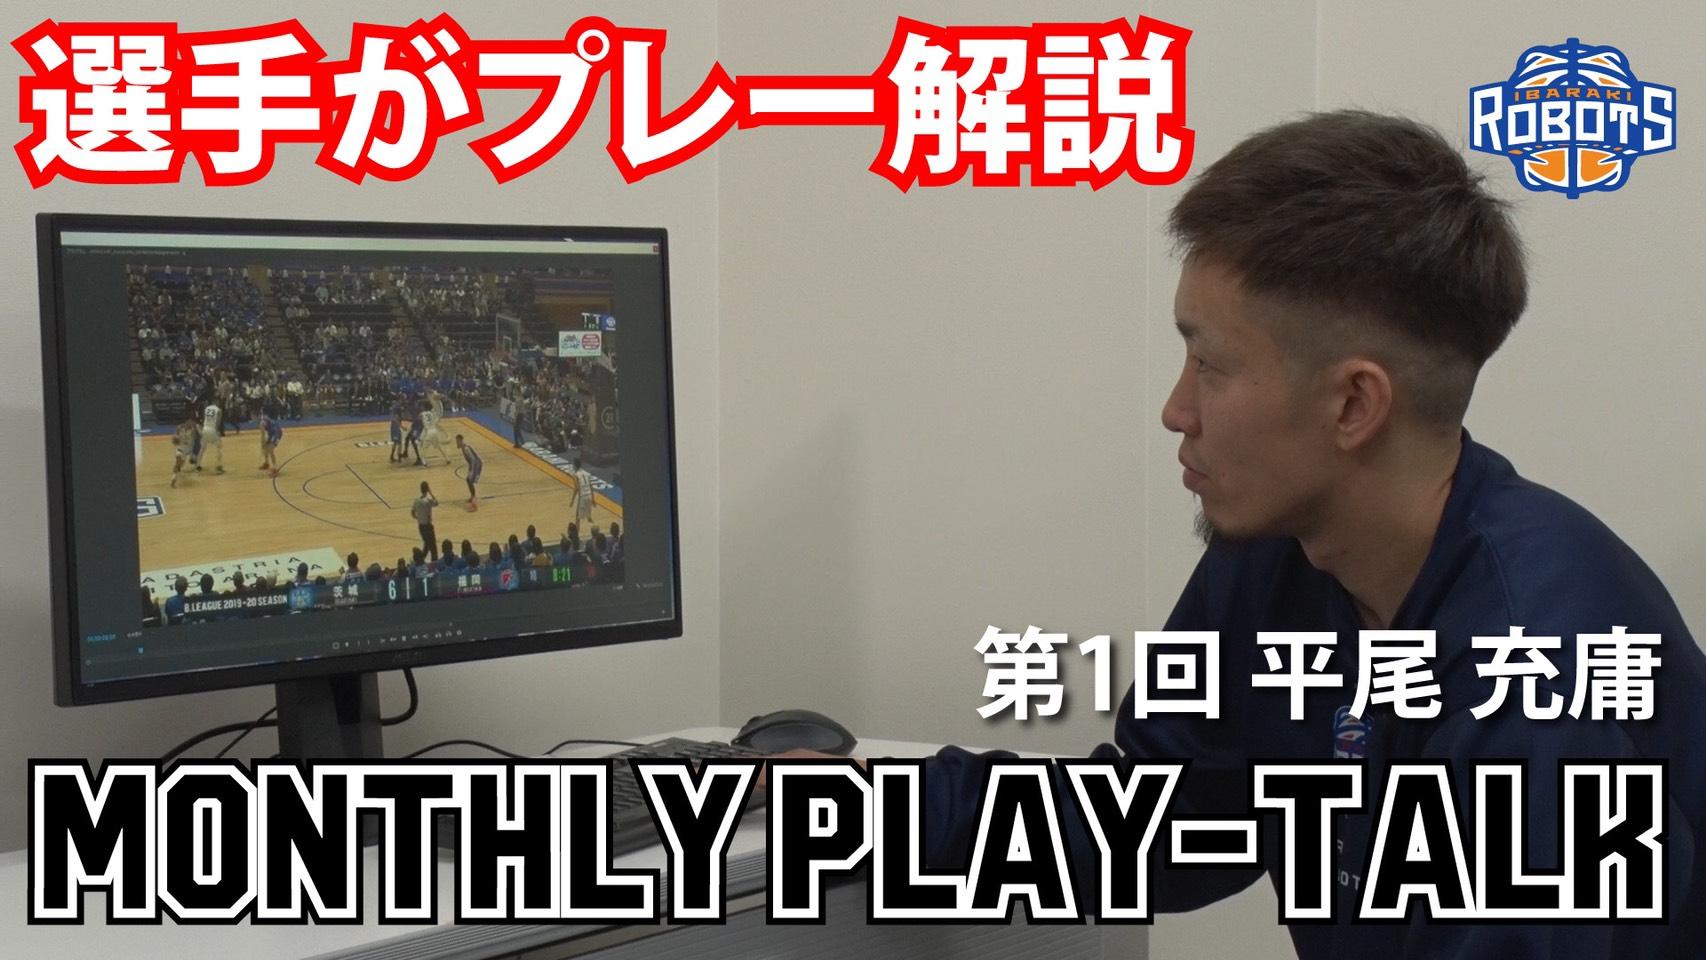 【ROBOTS TV】『MONTHLY PLAY-TALK | 平尾 充庸選手 第1回 Vol.1』